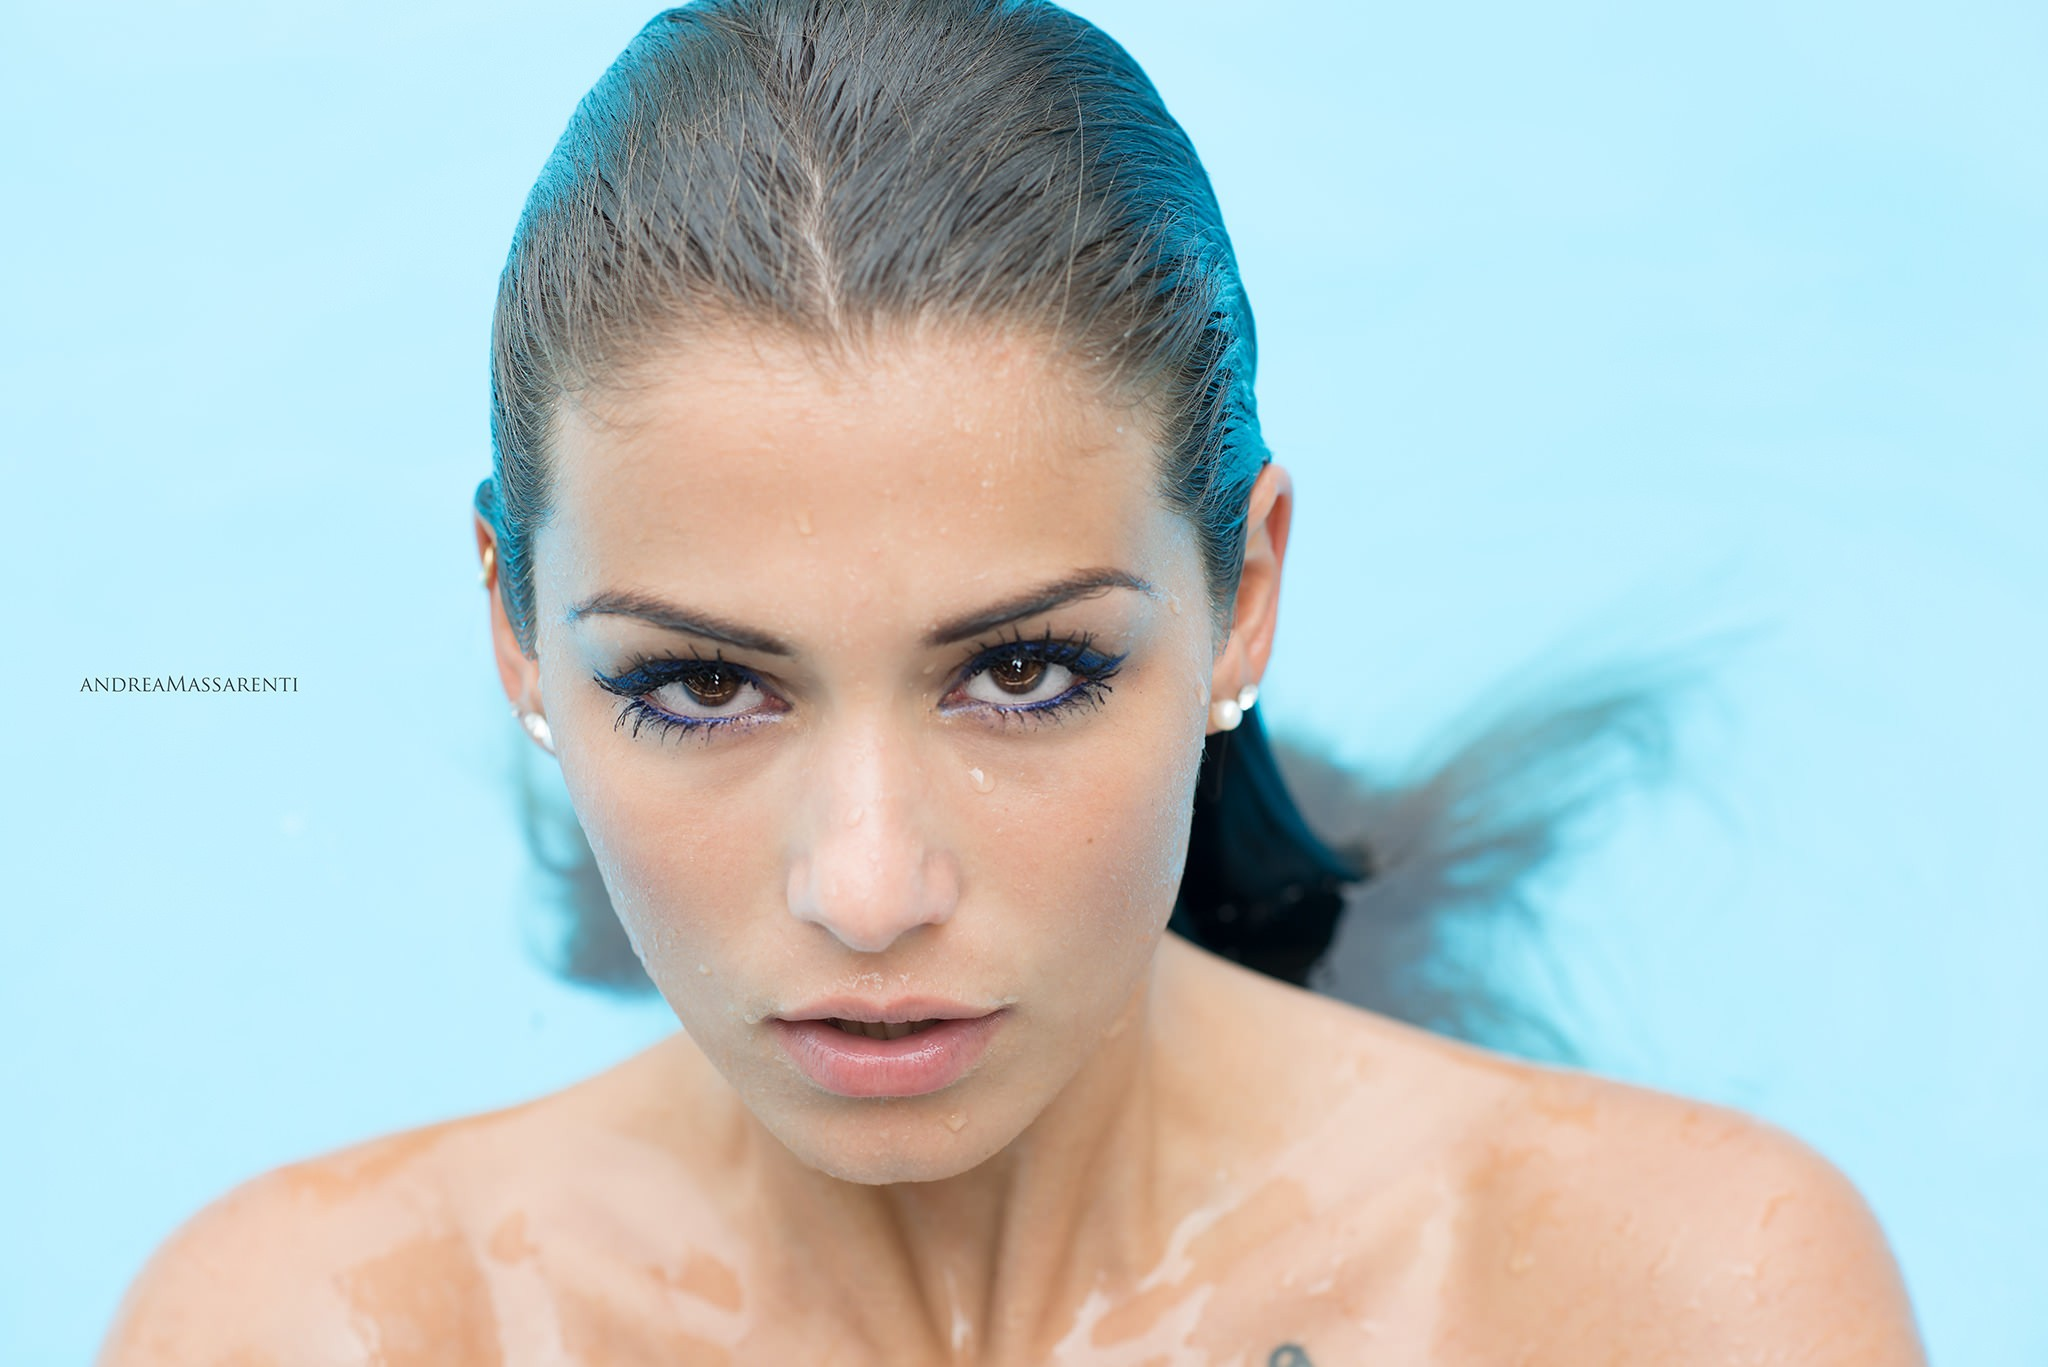 People 2048x1367 women face portrait wet hair